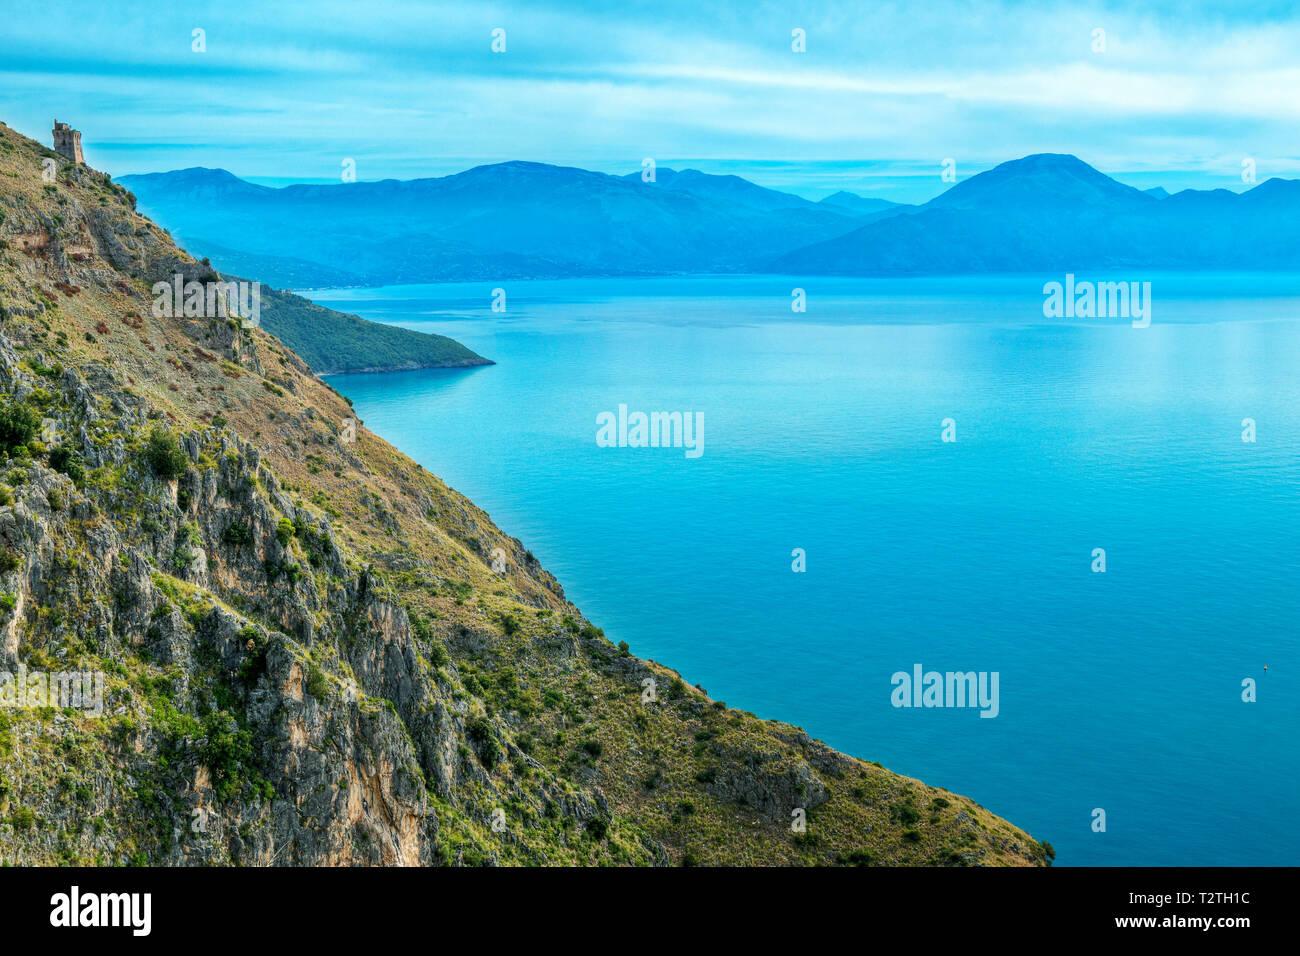 Italy, Campania, Cilento National Park,  Masseta and Infreschi Marine protected area, Morice watchtower and Policastro Gulf - Stock Image